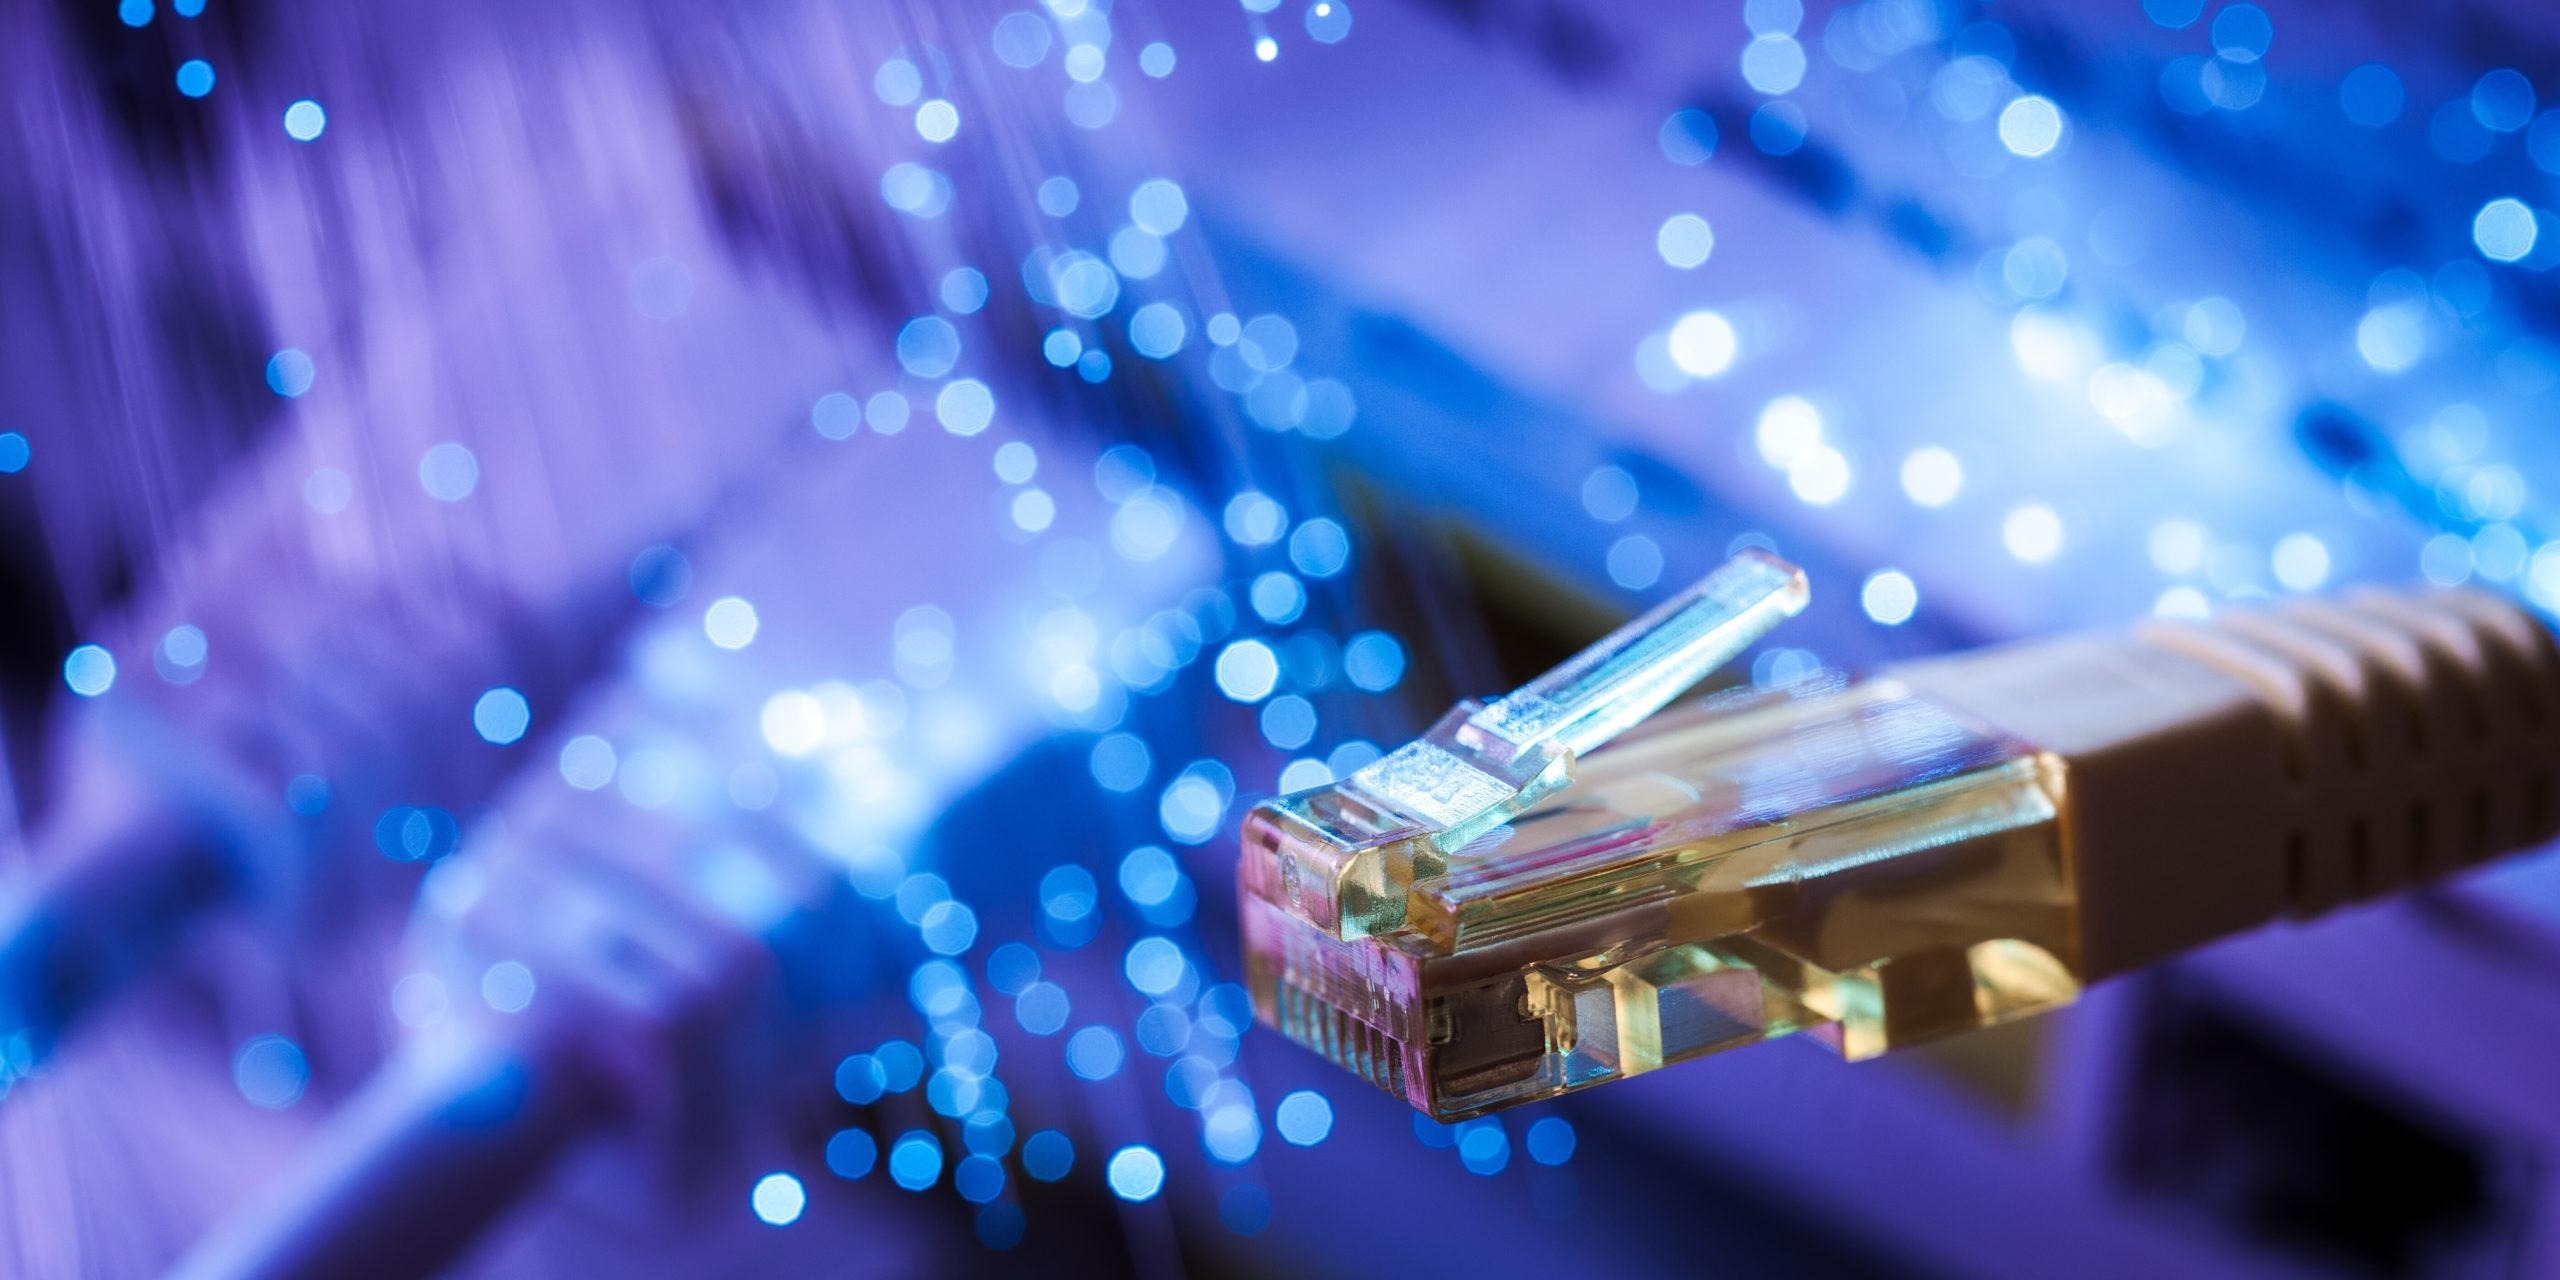 network-as-a-service-naas-digital-chiefs